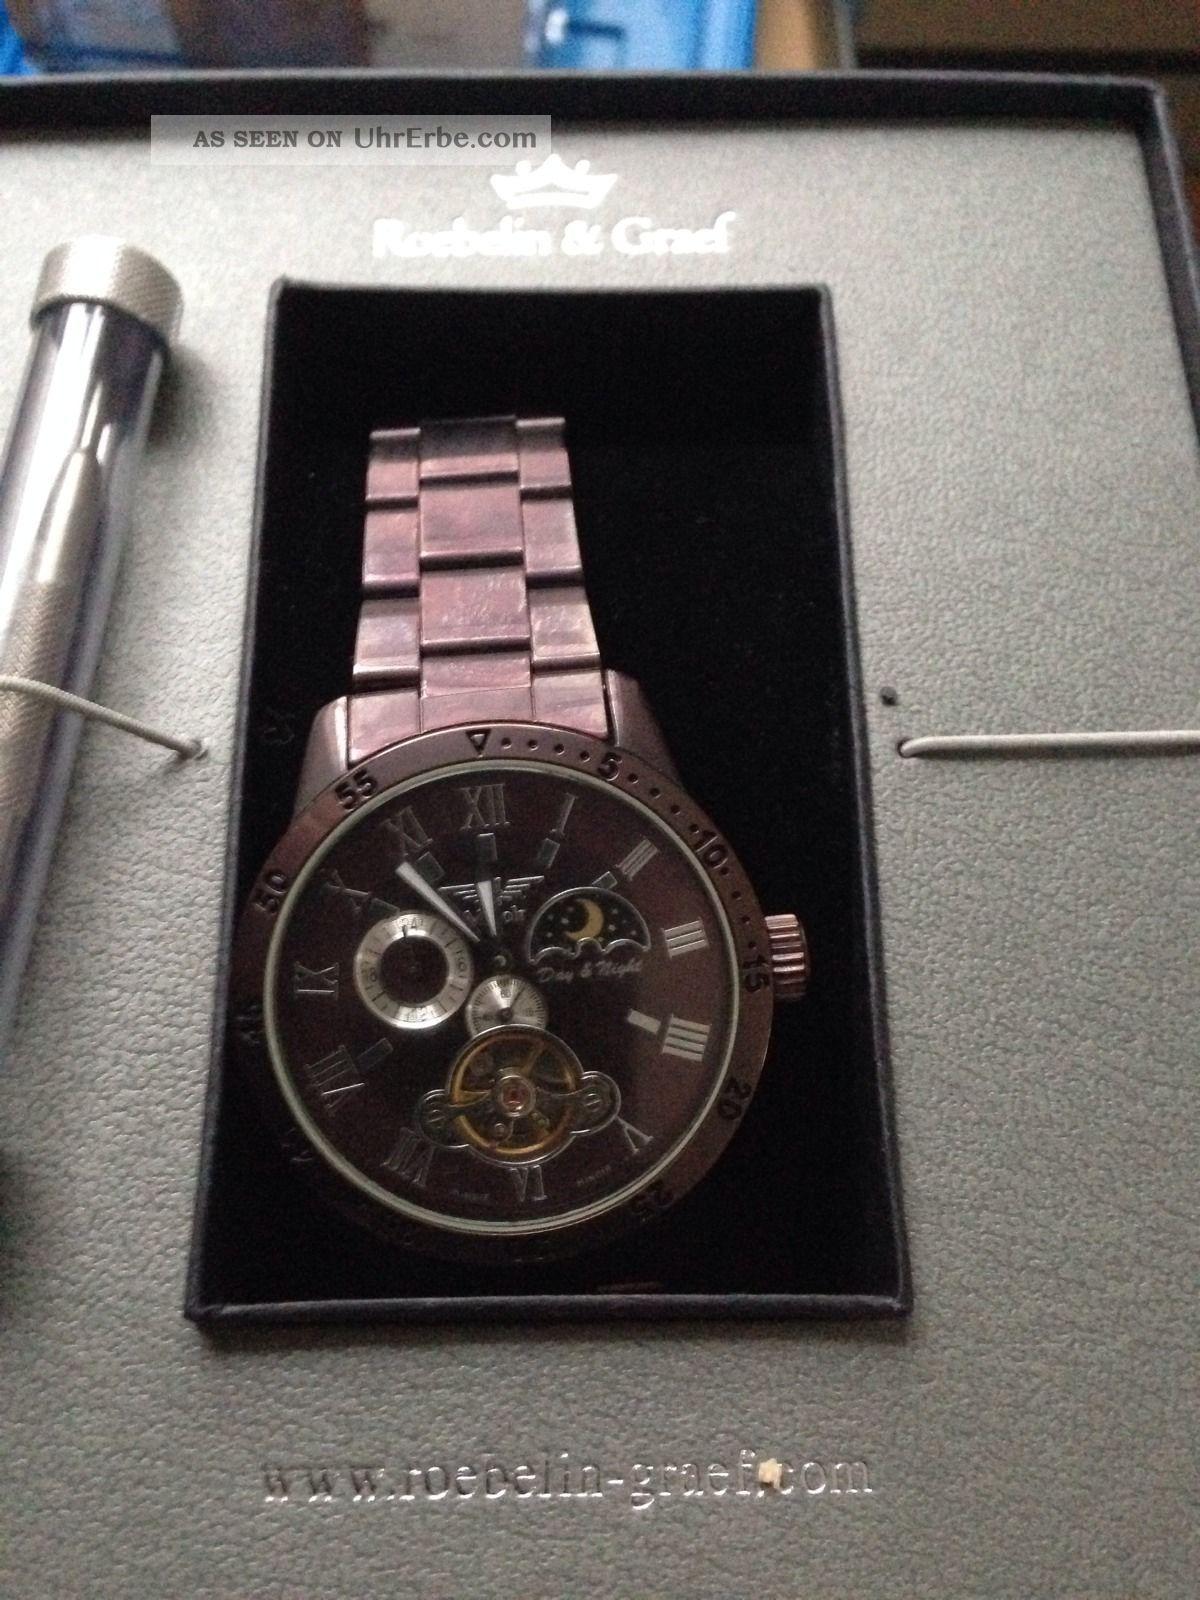 Roebelin & Graef Karthago Automatikuhr,  Armbanduhr,  Herrenuhr,  Sonne Mondphase Armbanduhren Bild